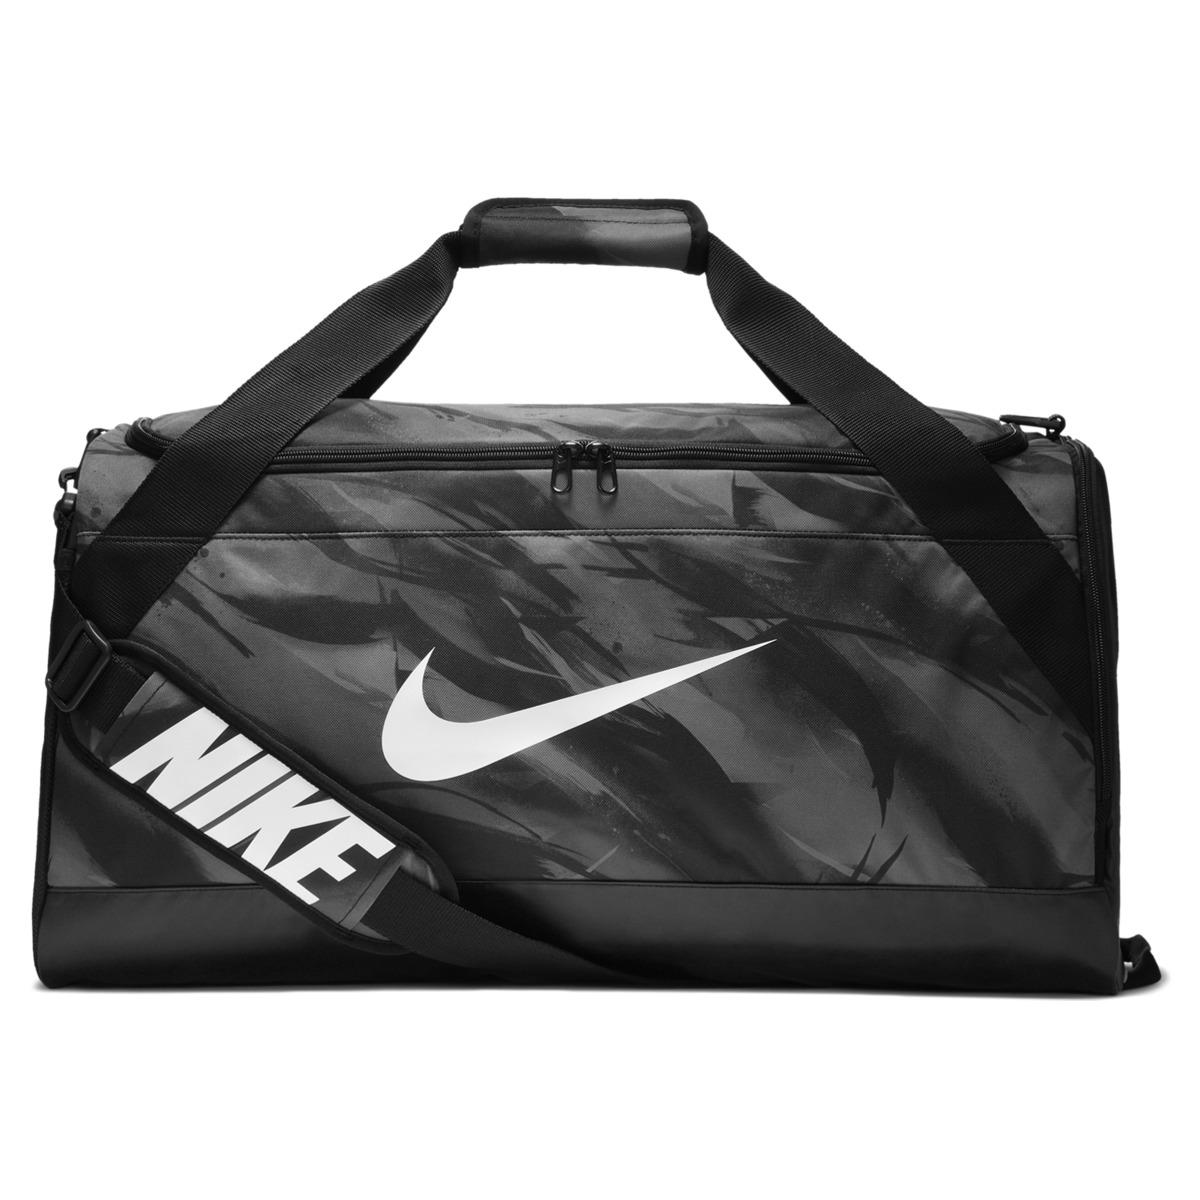 7f1993ecfb Nike - Black Brasilia M Training Duffel Sports Bag for Men - Lyst. View  fullscreen